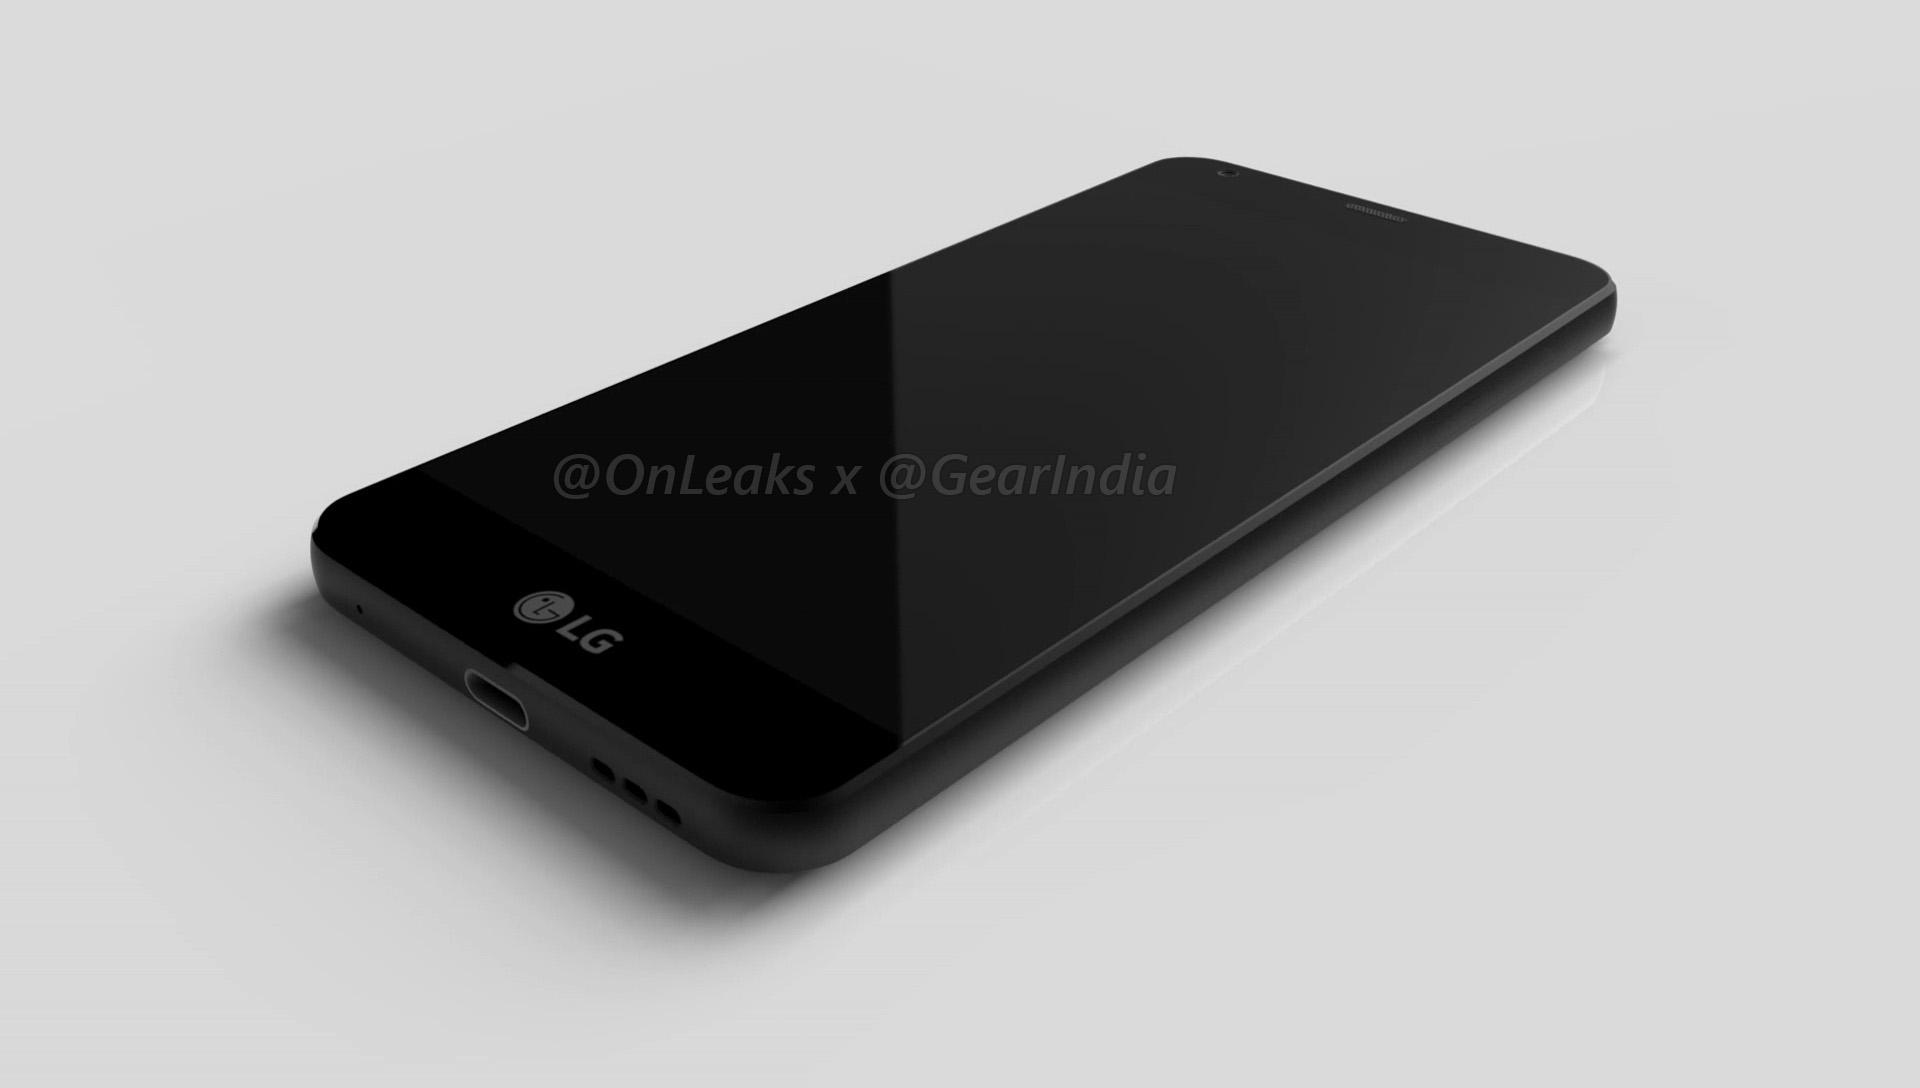 LG confirme que le LG G6 ne sera pas modulaire